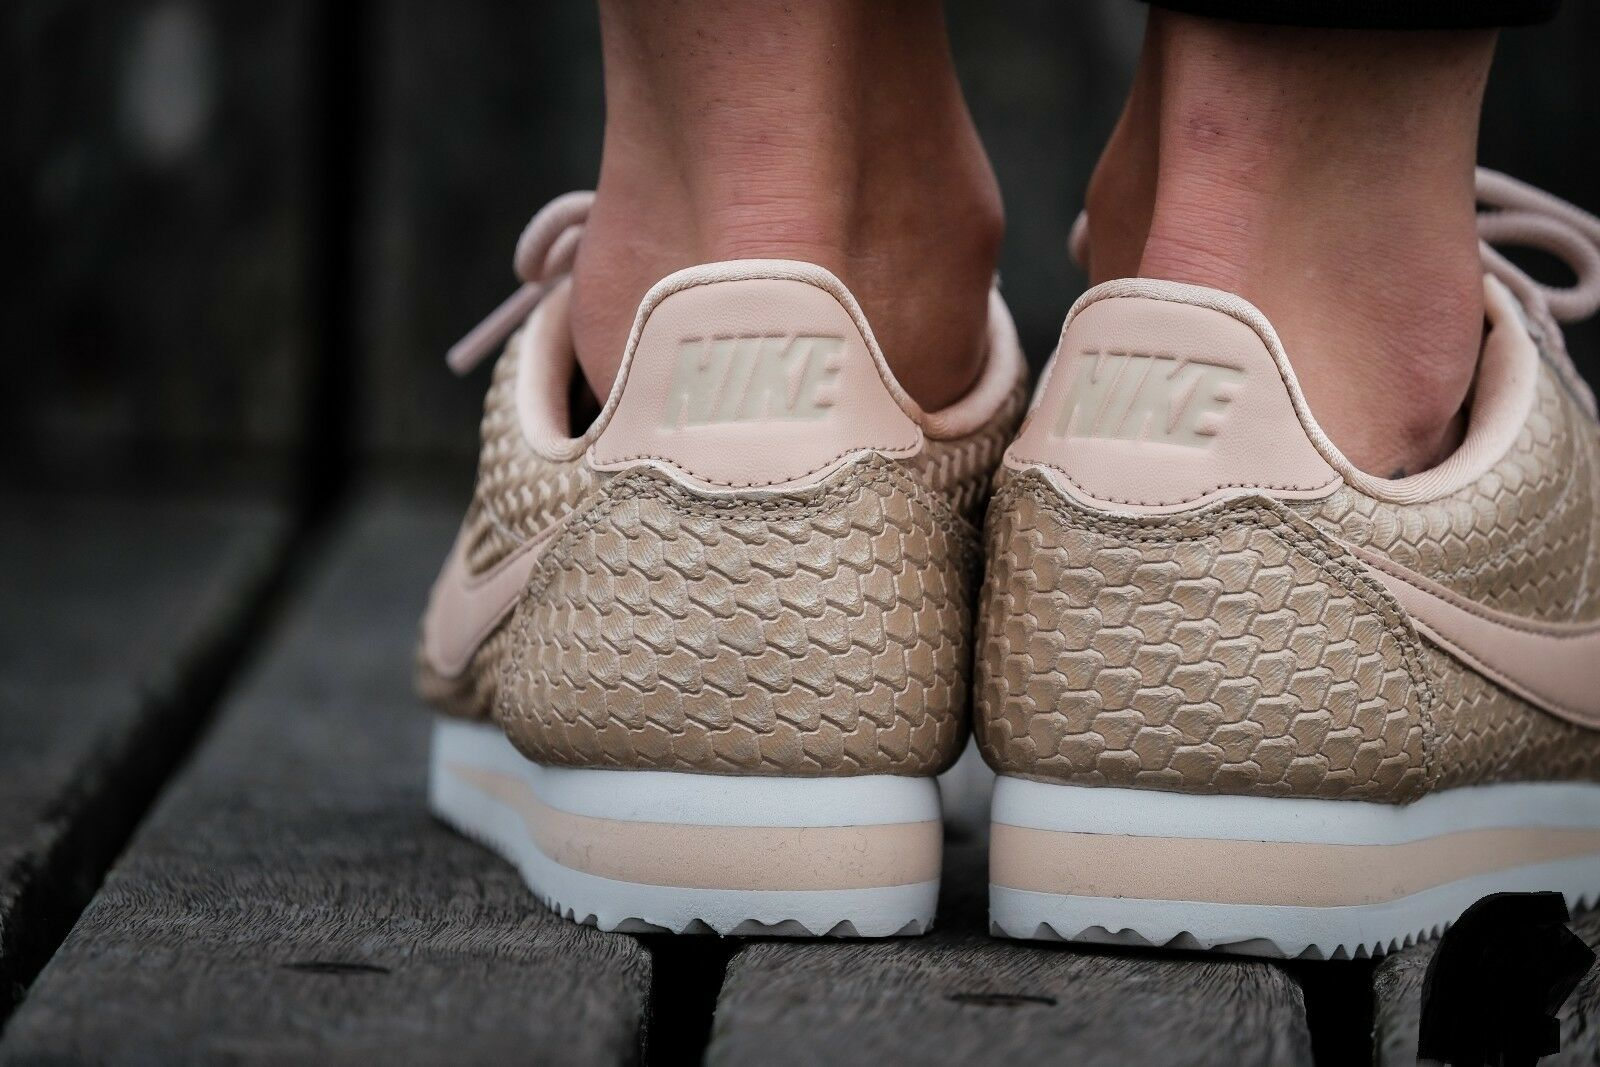 Nike 900 cortez se 902856 900 Nike blur/bio classic beige/light orewood Braun wmn sz 7 babf01